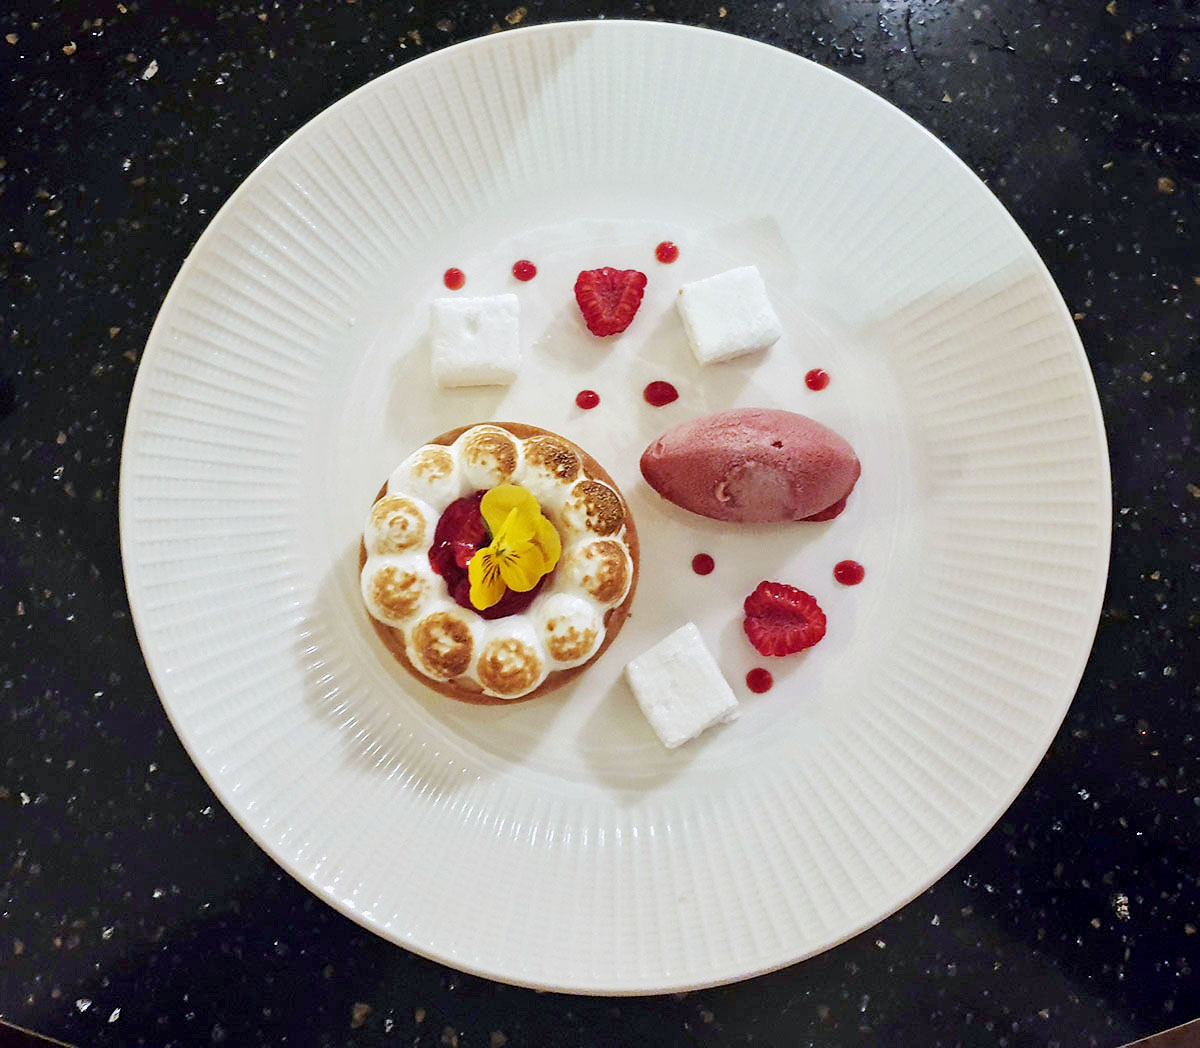 Lemon meringue pie - Piazza Italiana